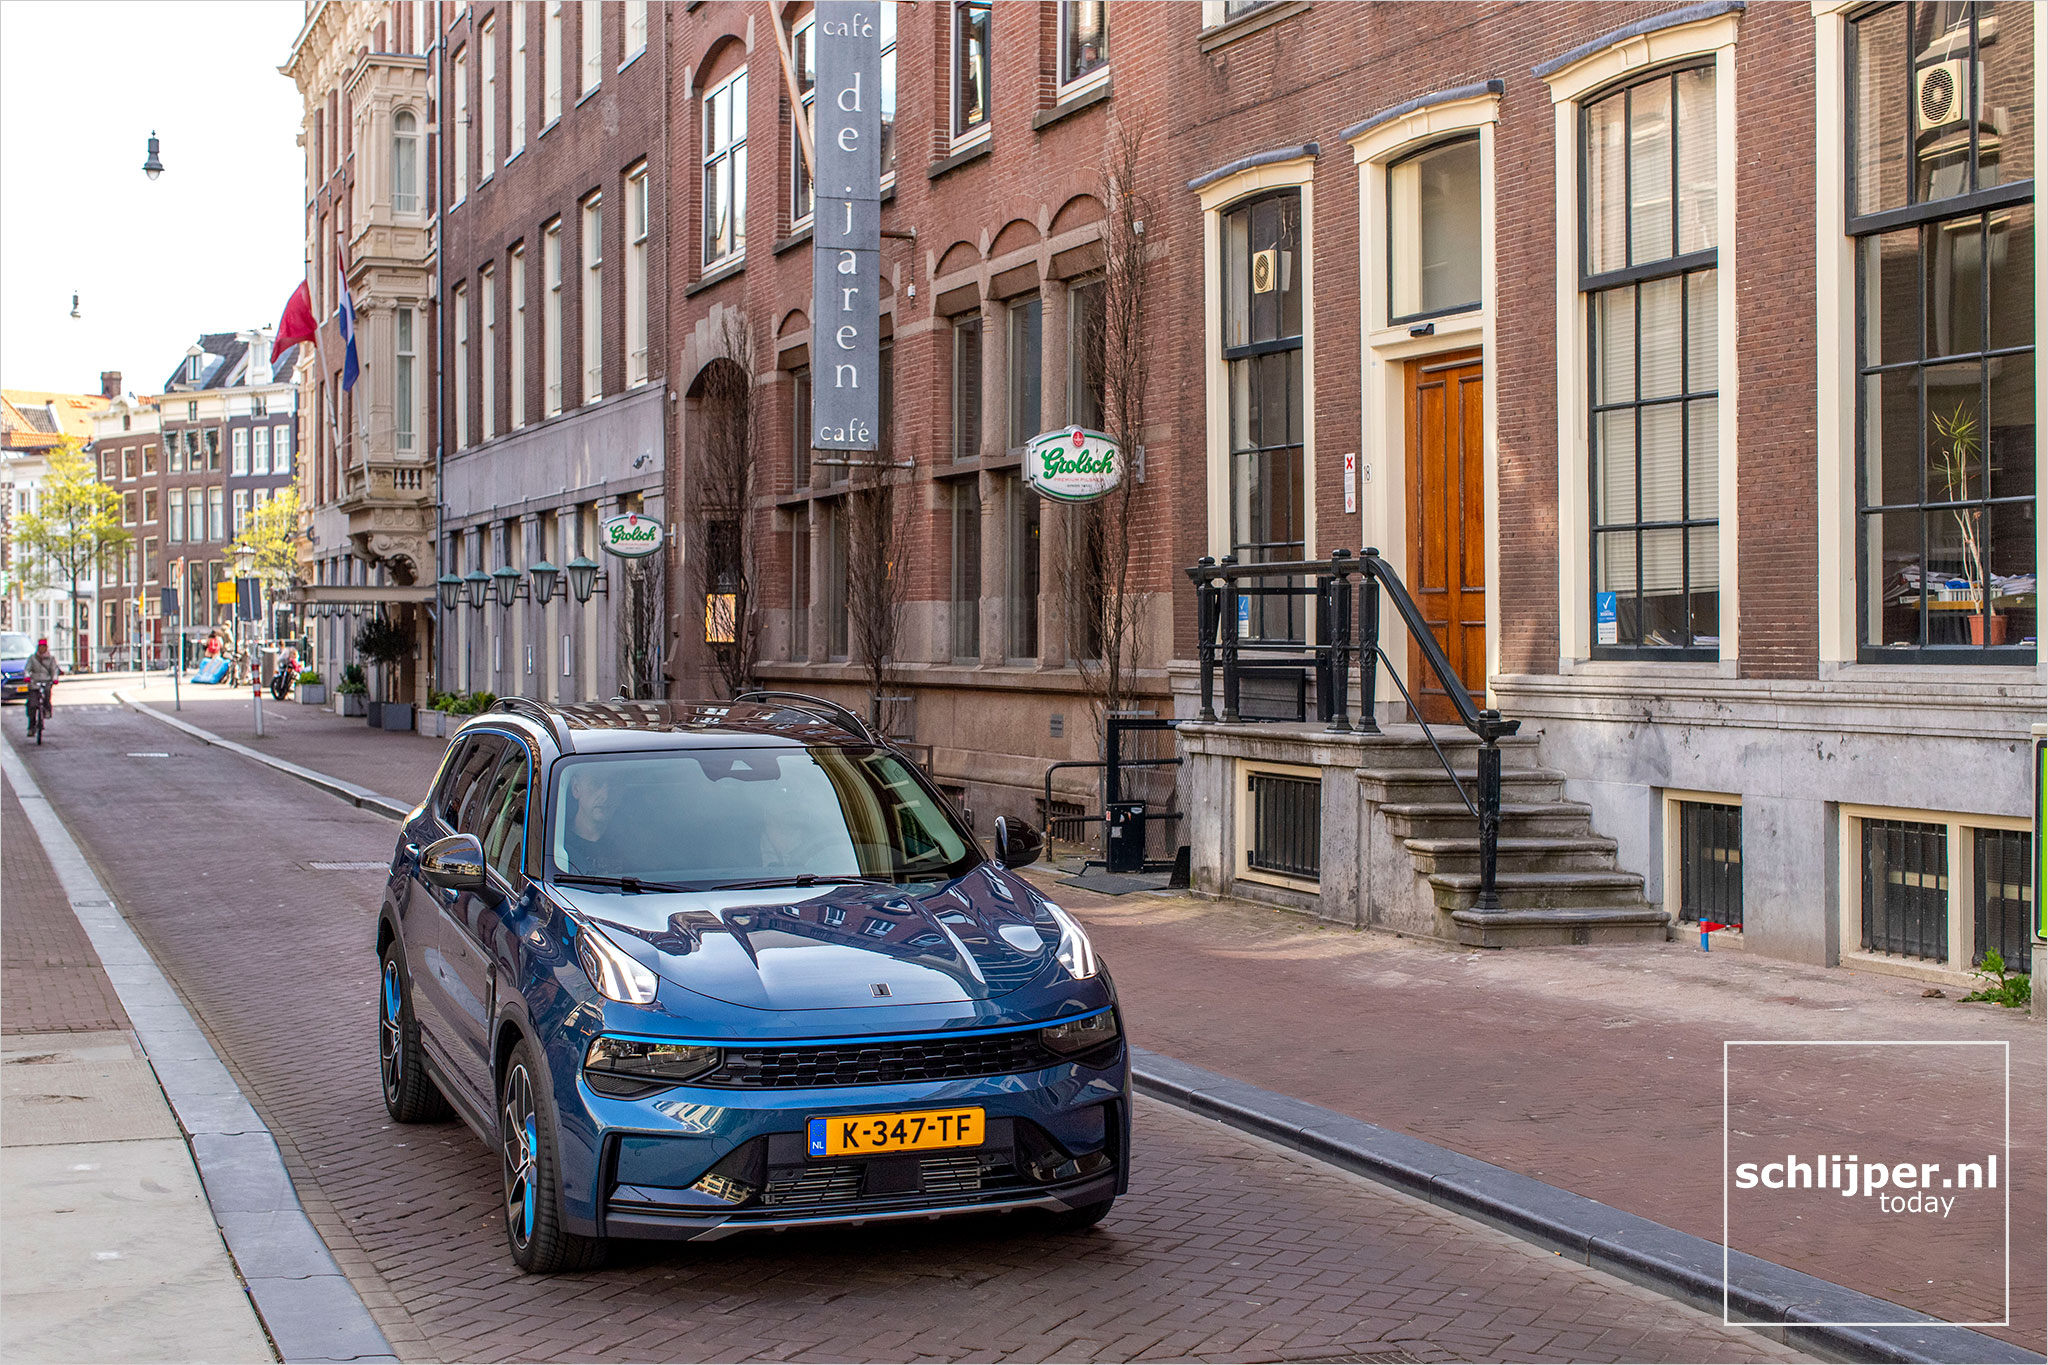 The Netherlands, Amsterdam, 23 april 2021